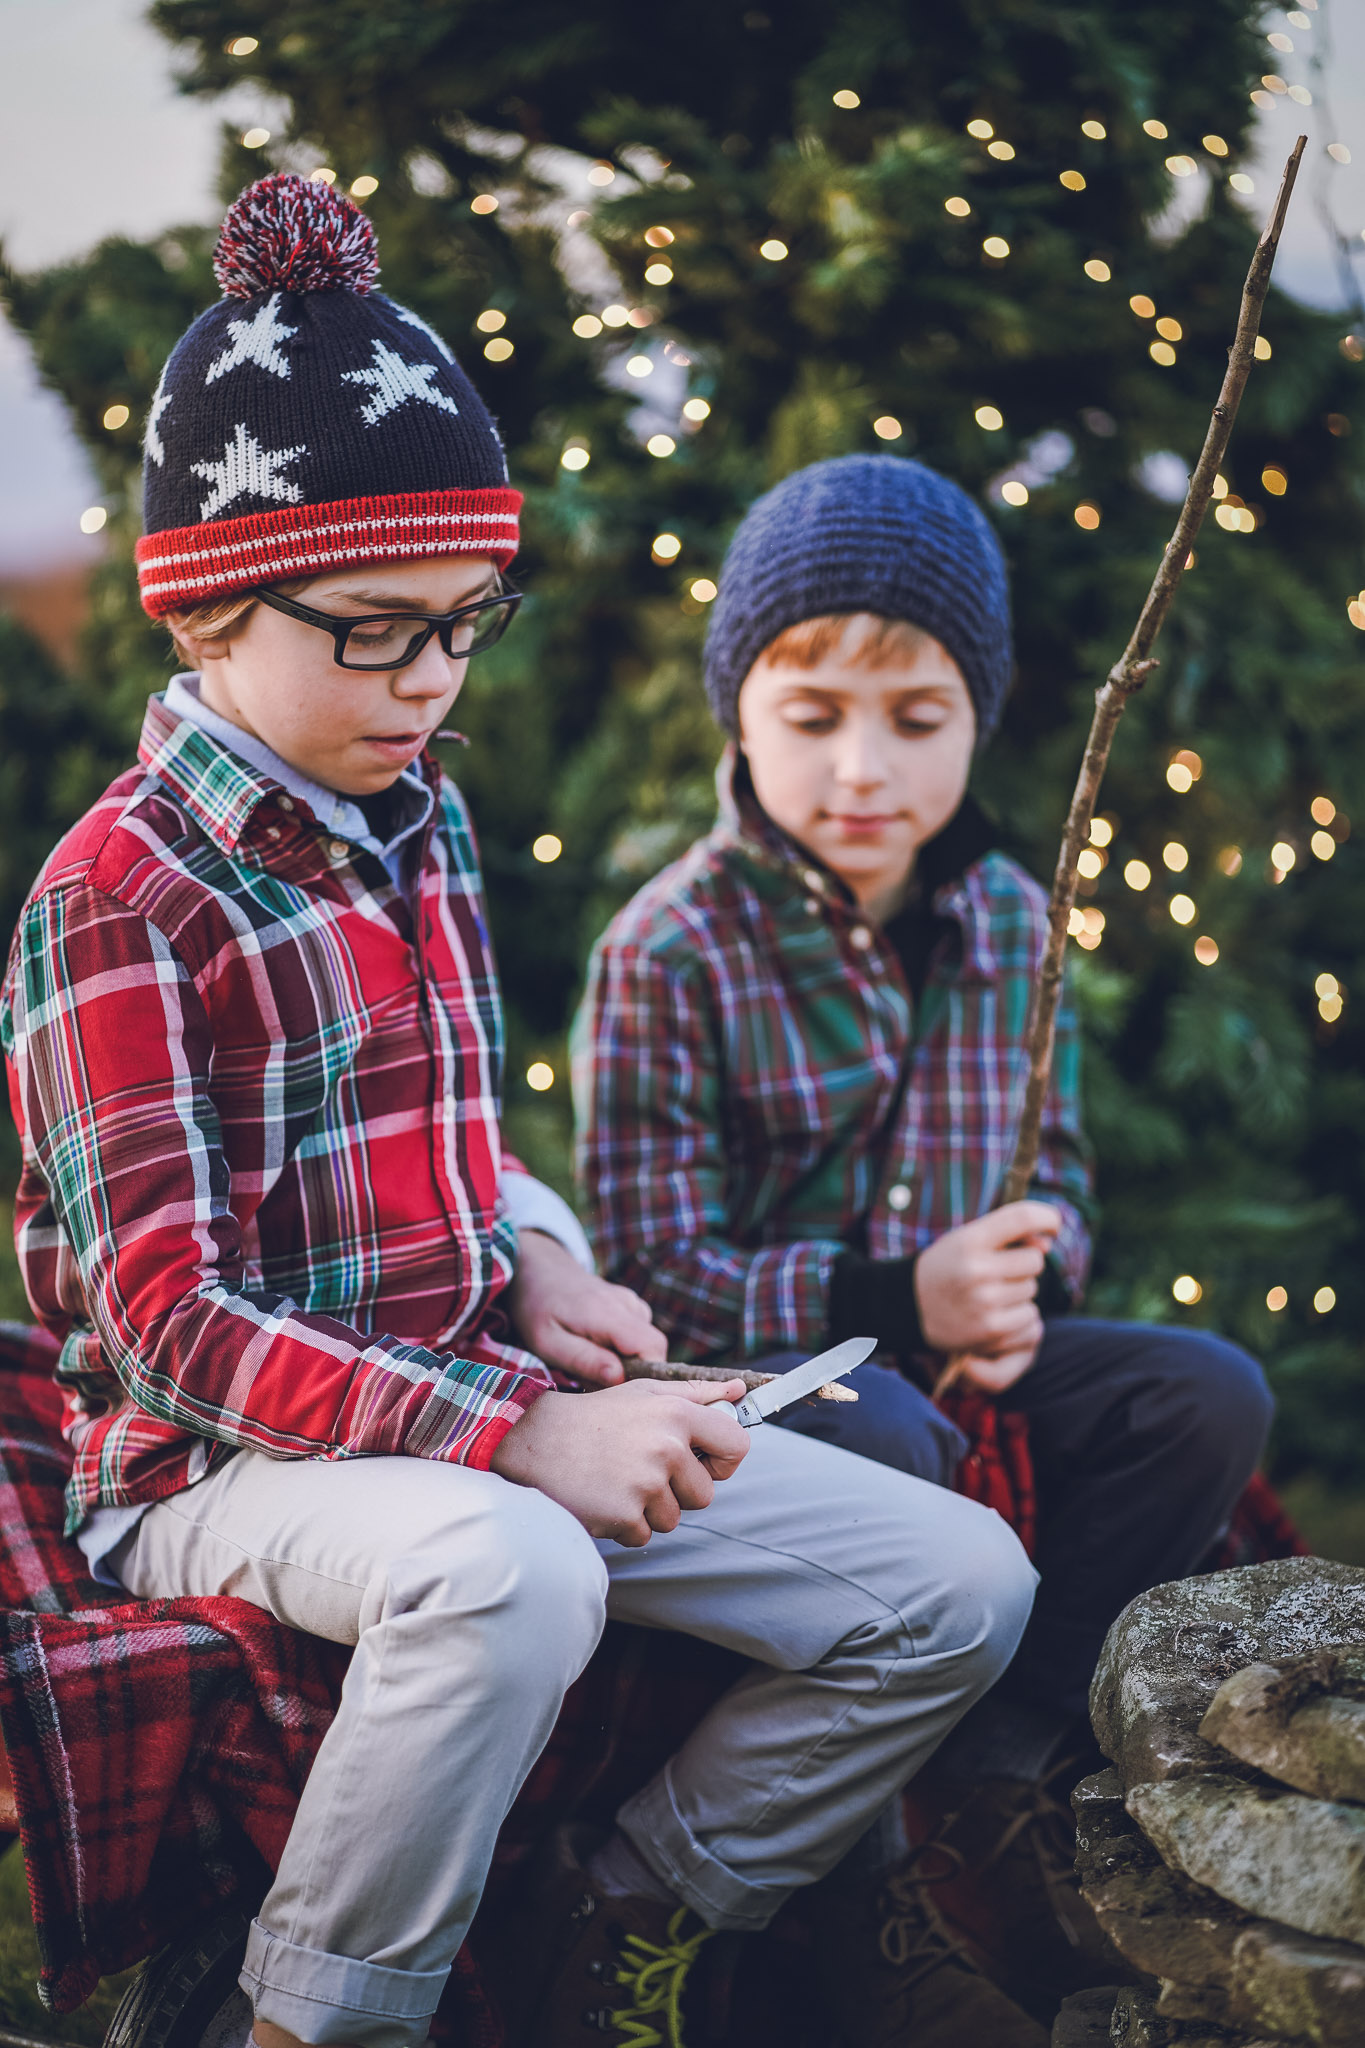 Clarks-Summit-Scranton-Photographers-christmas-holidays-card-16.jpg